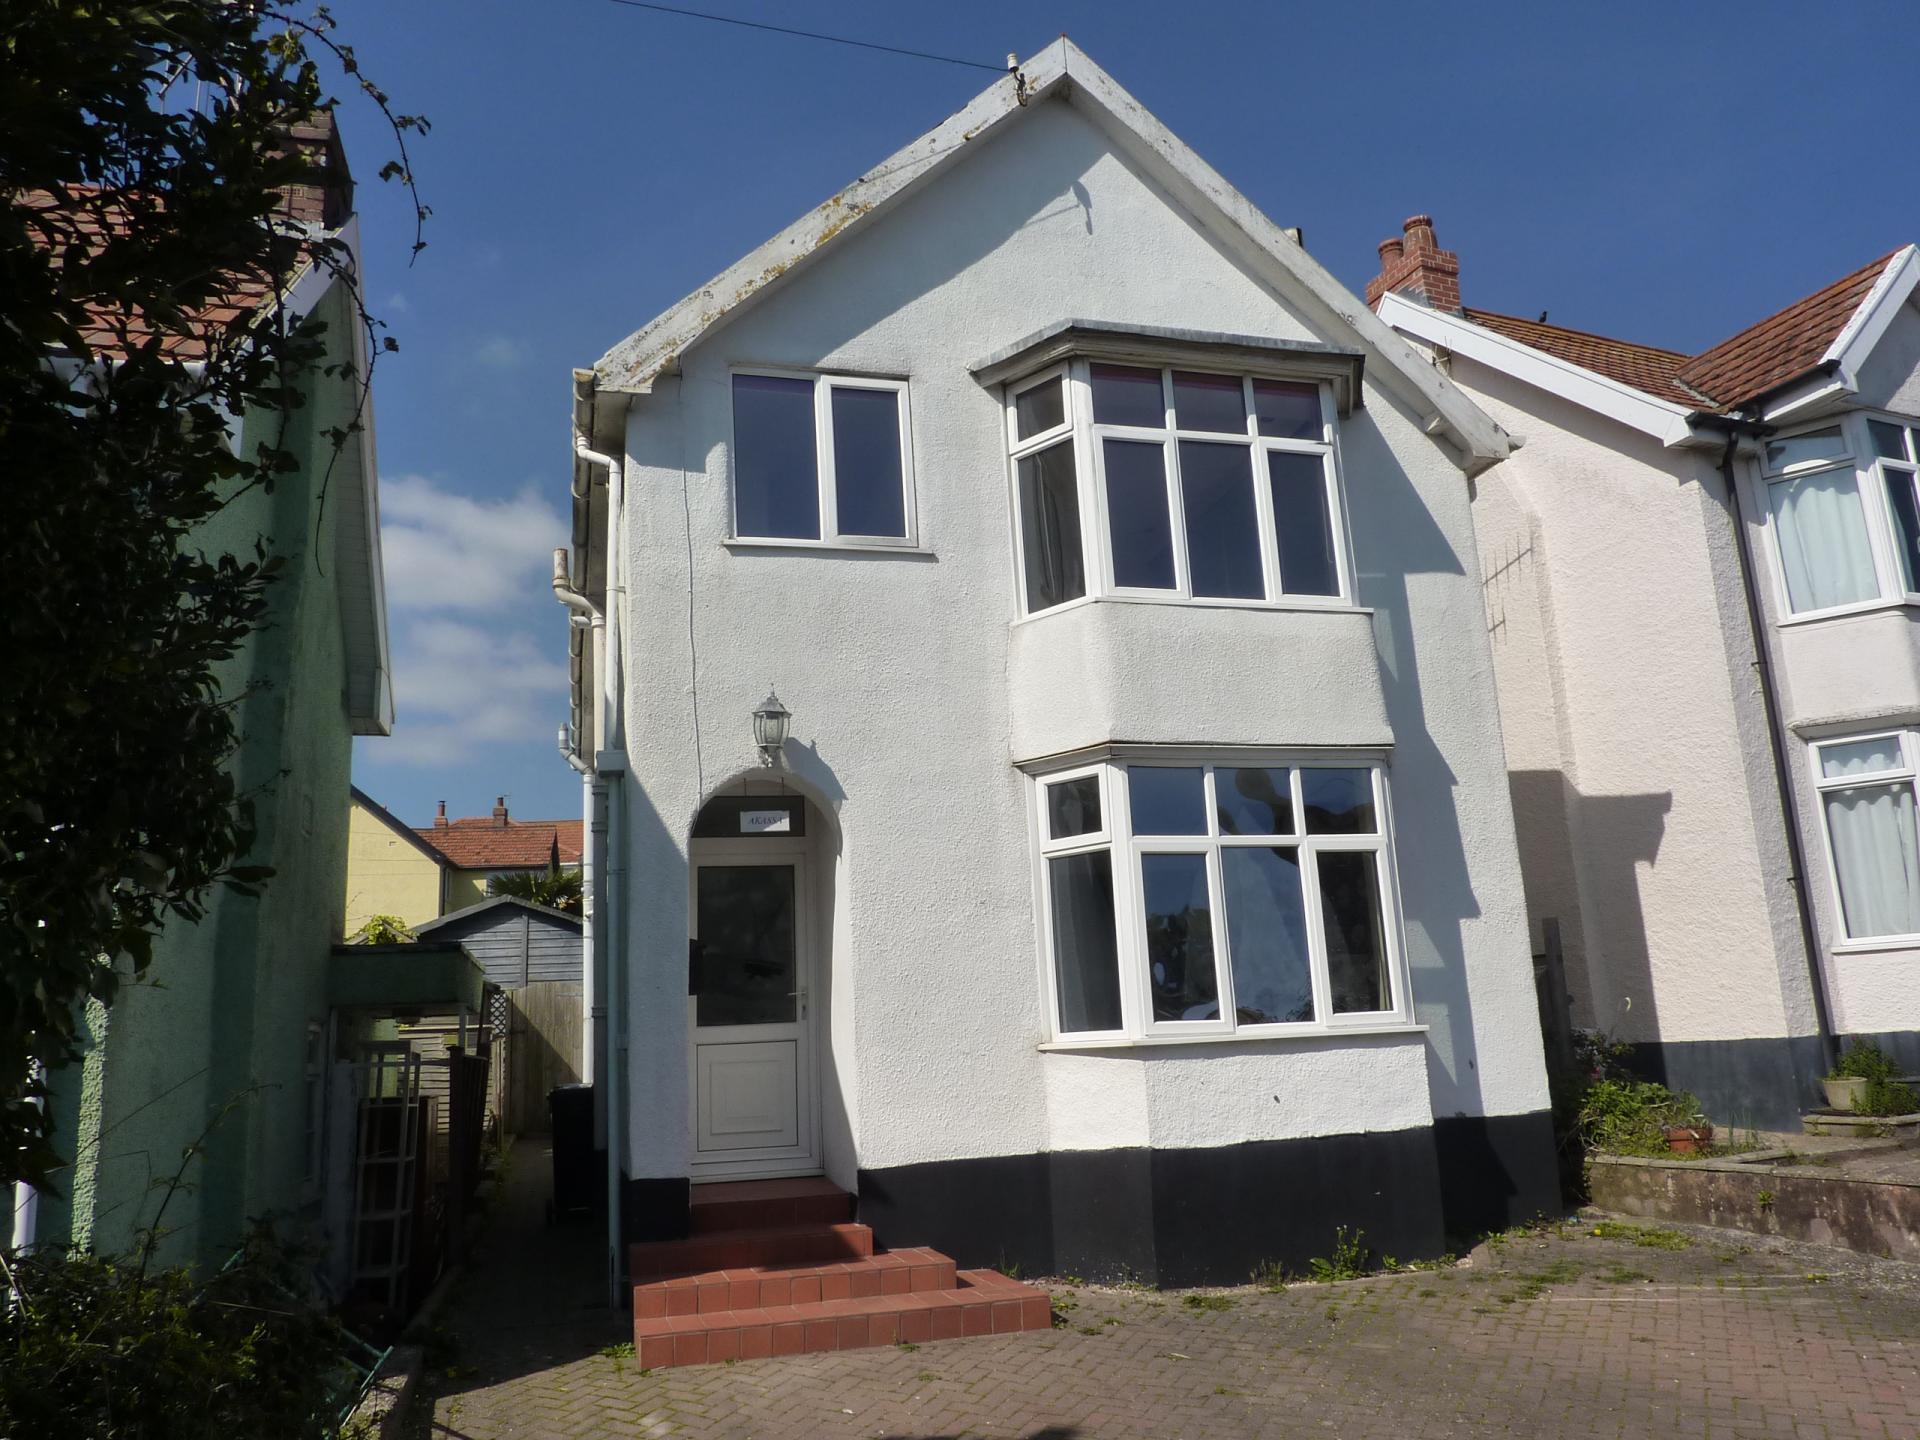 3 Bedrooms Property for sale in Ferndown Road, Lyme Regis